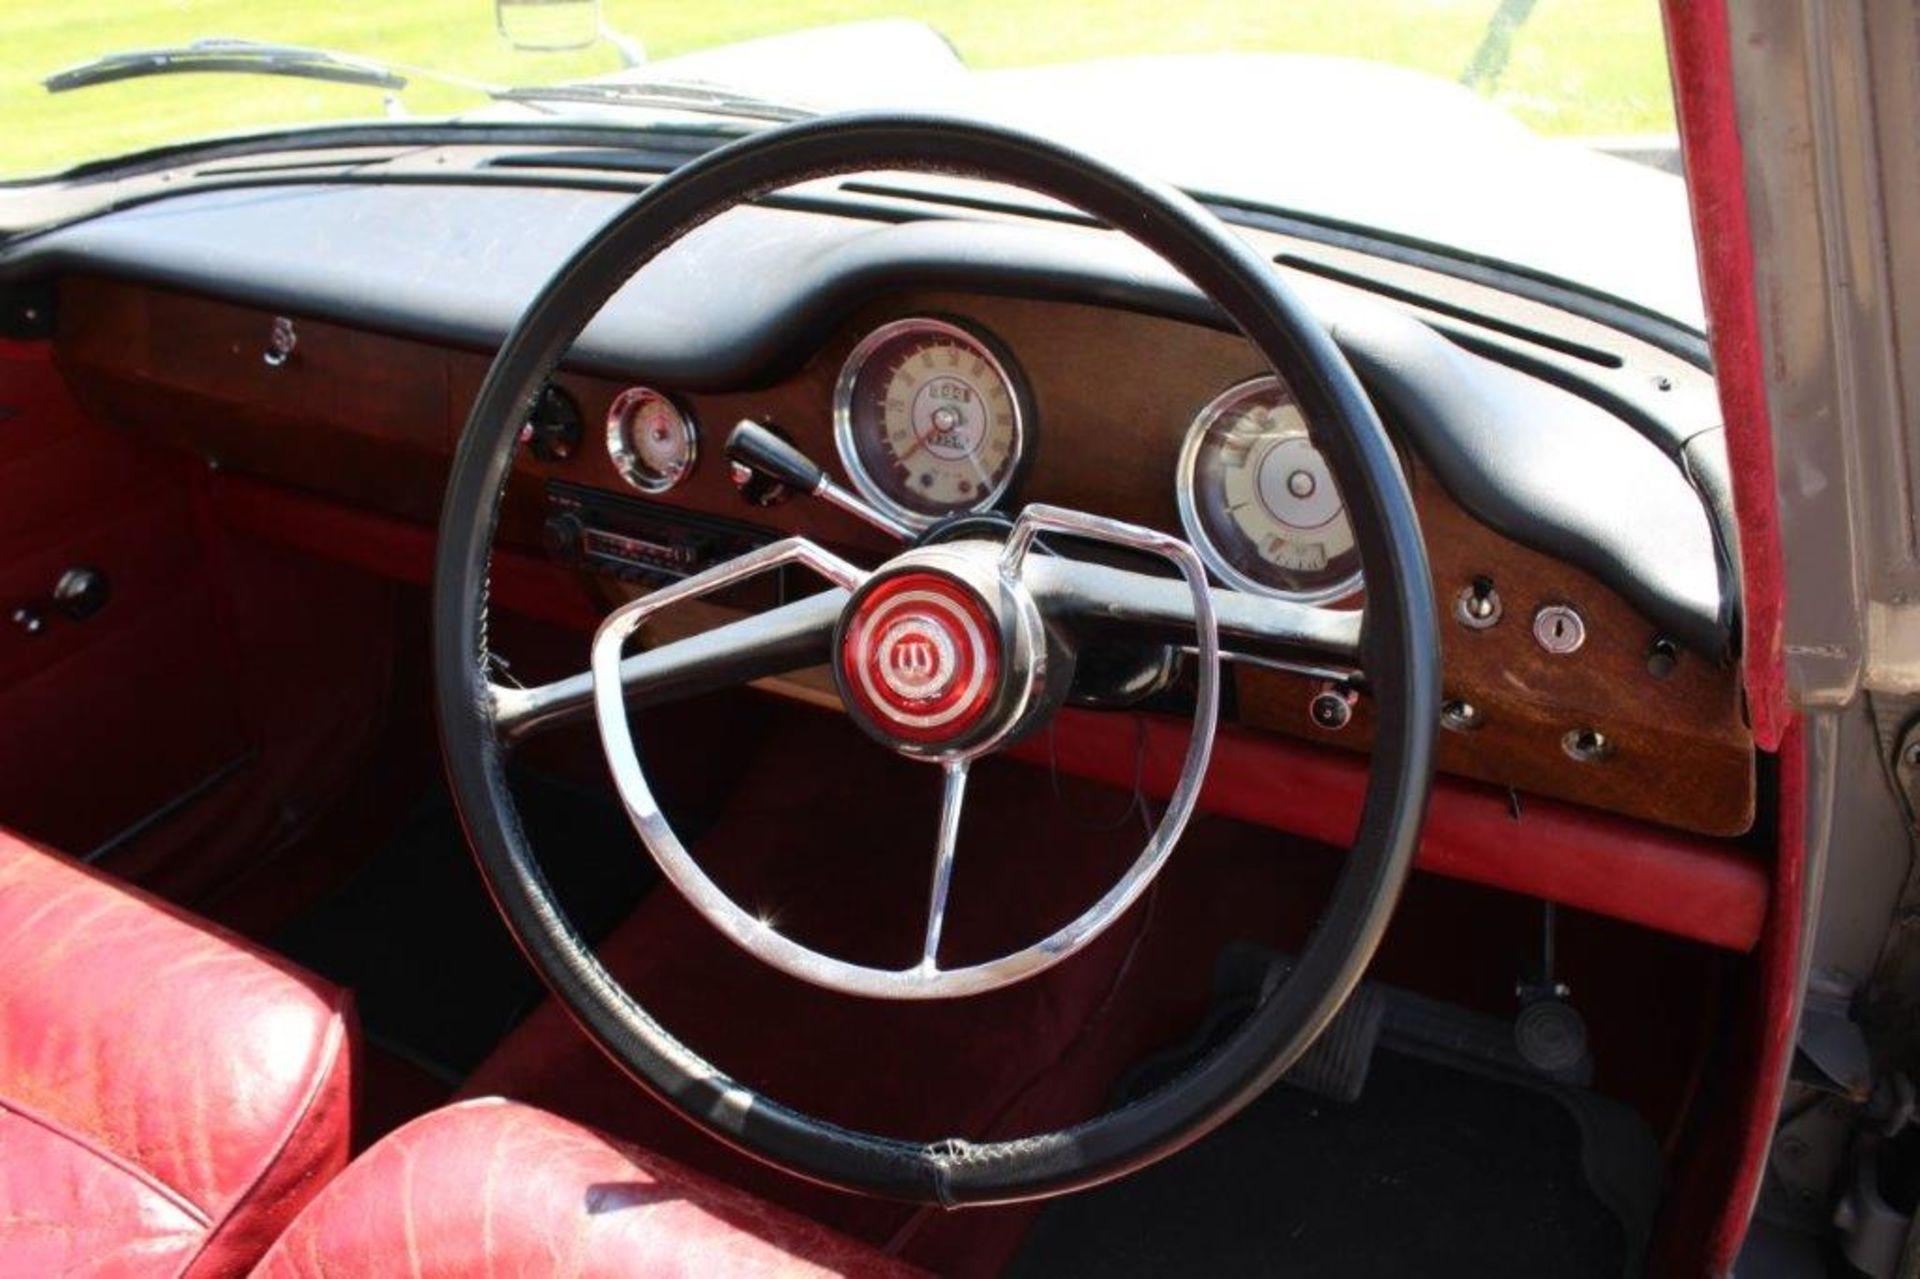 1969 Wolseley 16/60 Auto - Image 19 of 31